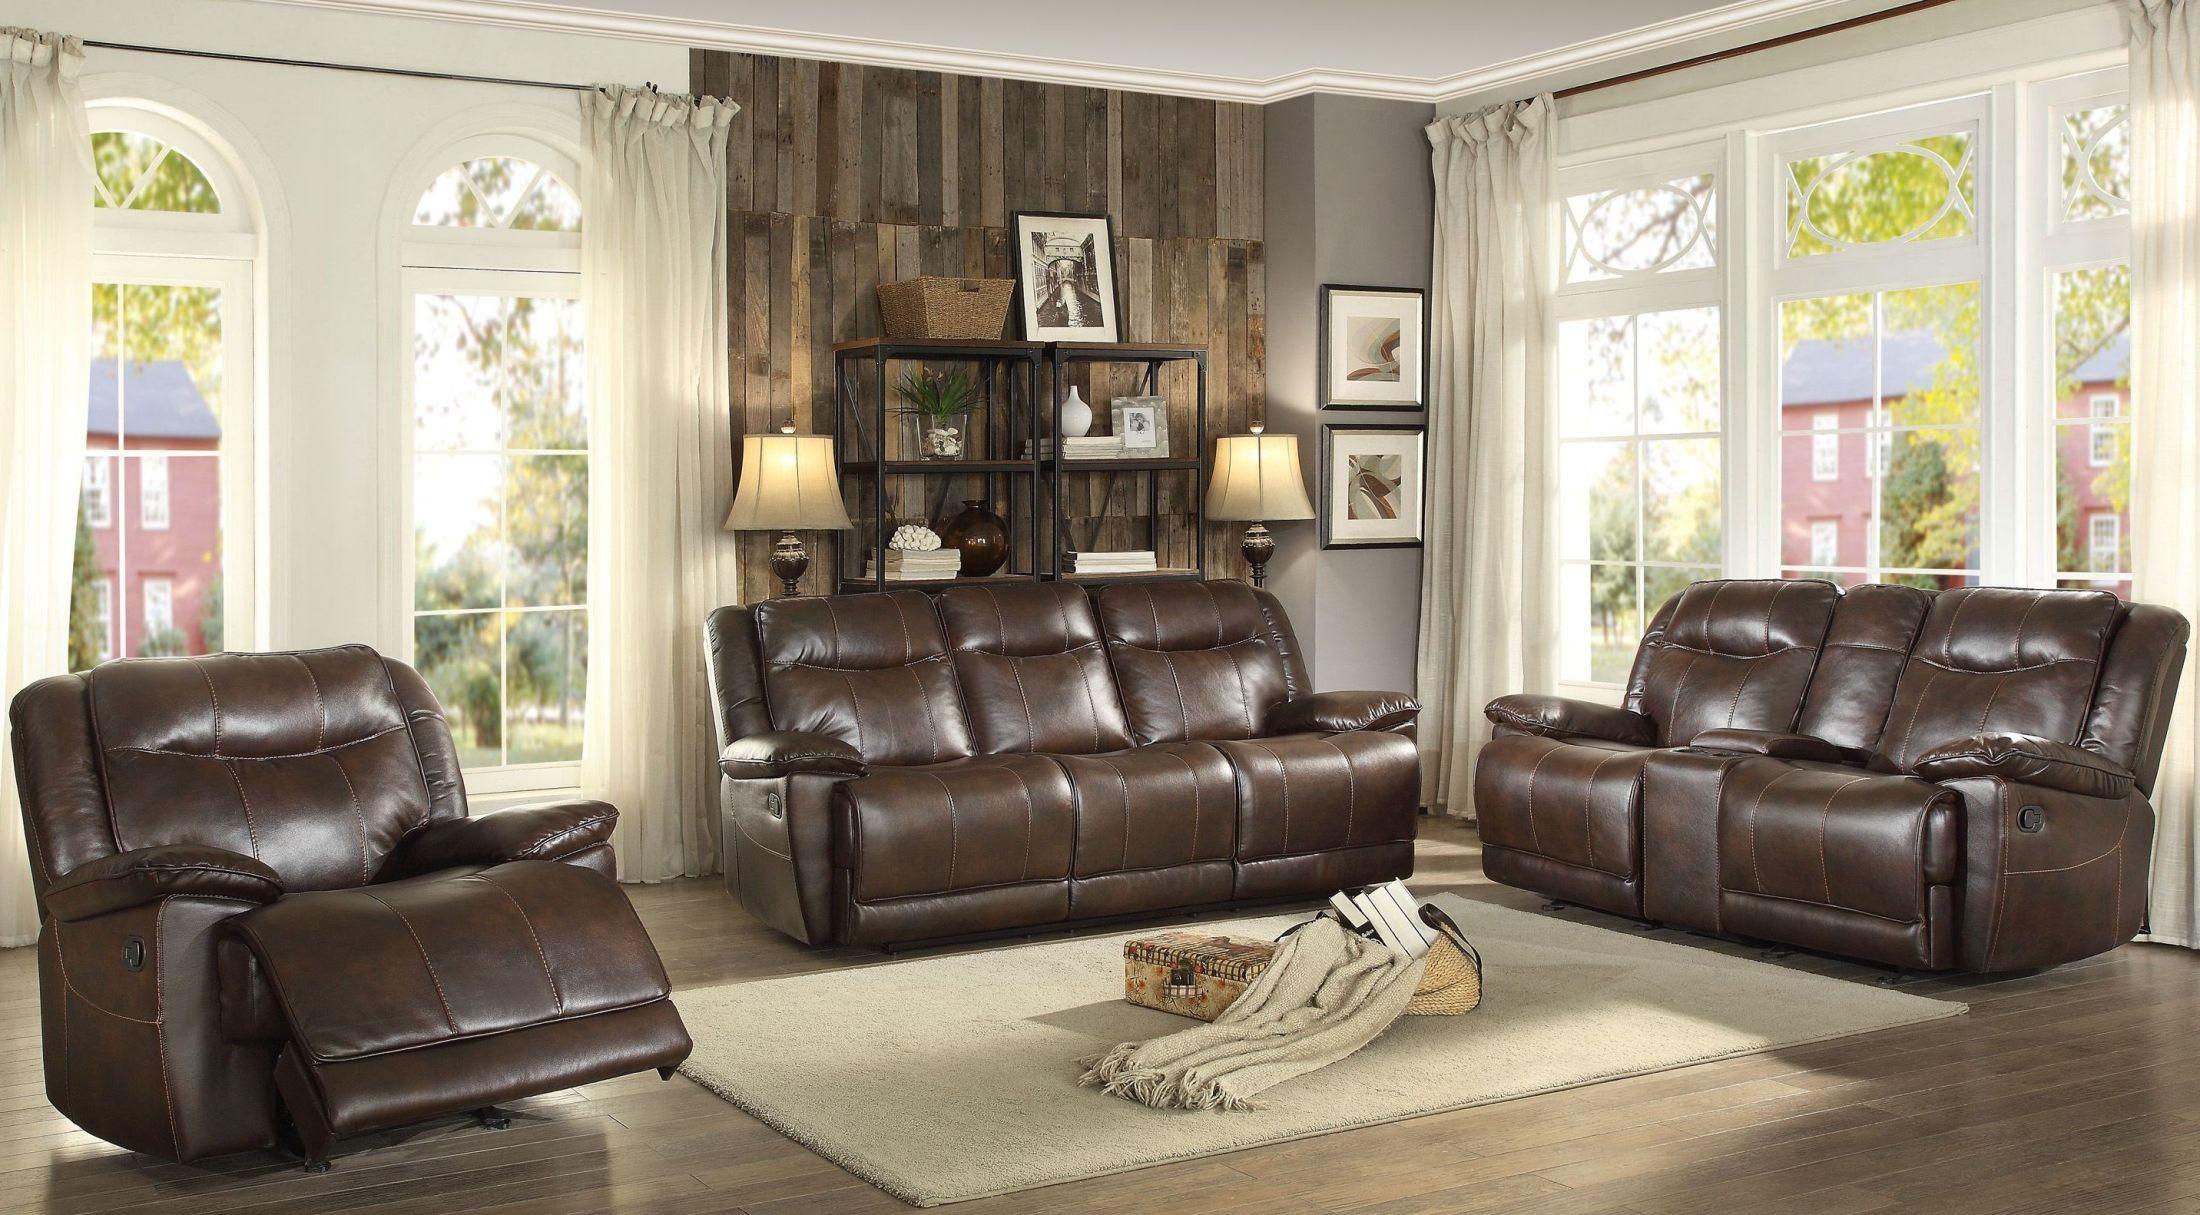 Wasola Dark Brown Triple Reclining Living Room Set From Homelegance Coleman Furniture